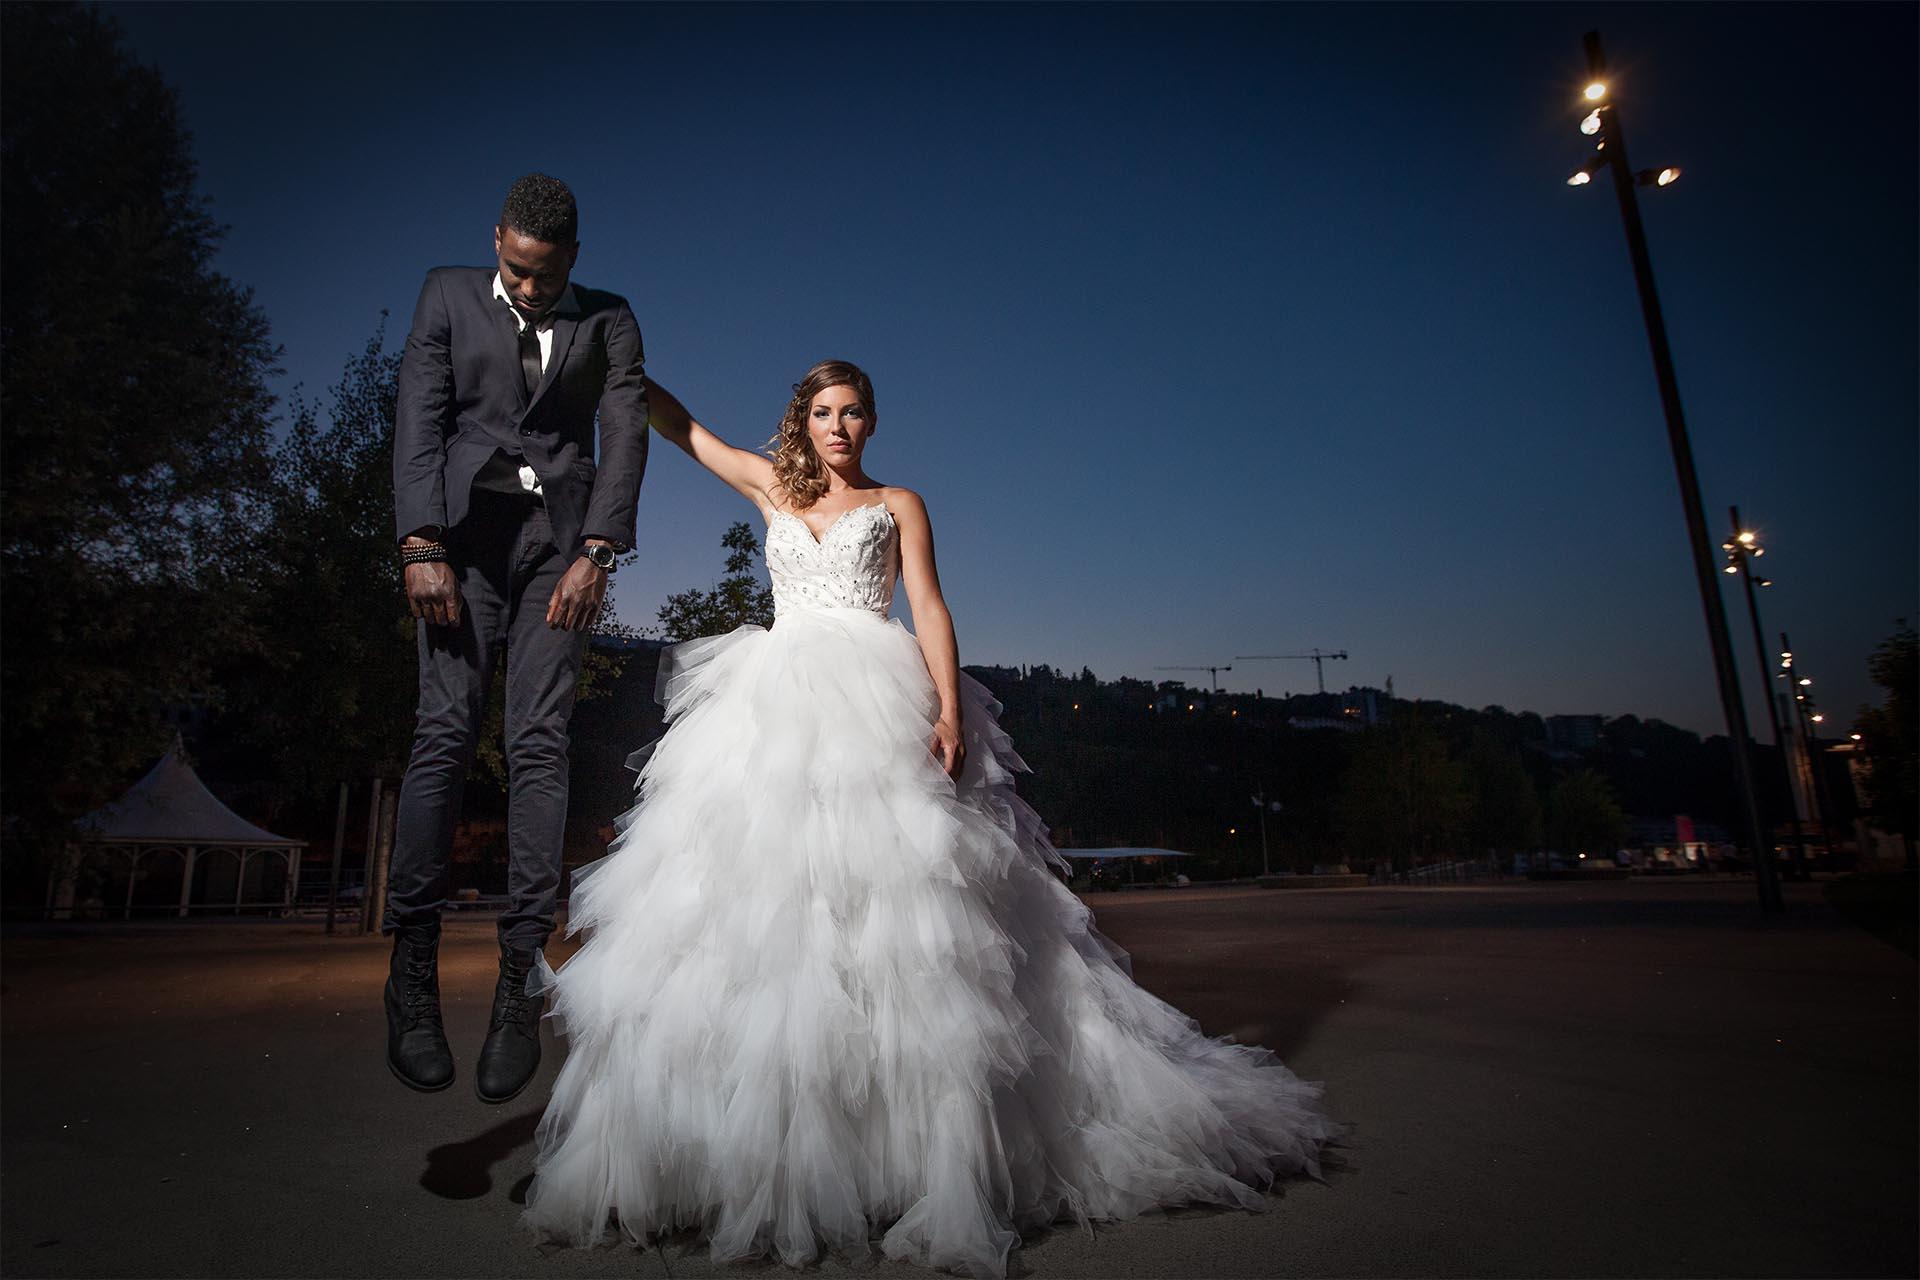 Photographe professionnel dg anglio photo - Photo de mariage ...